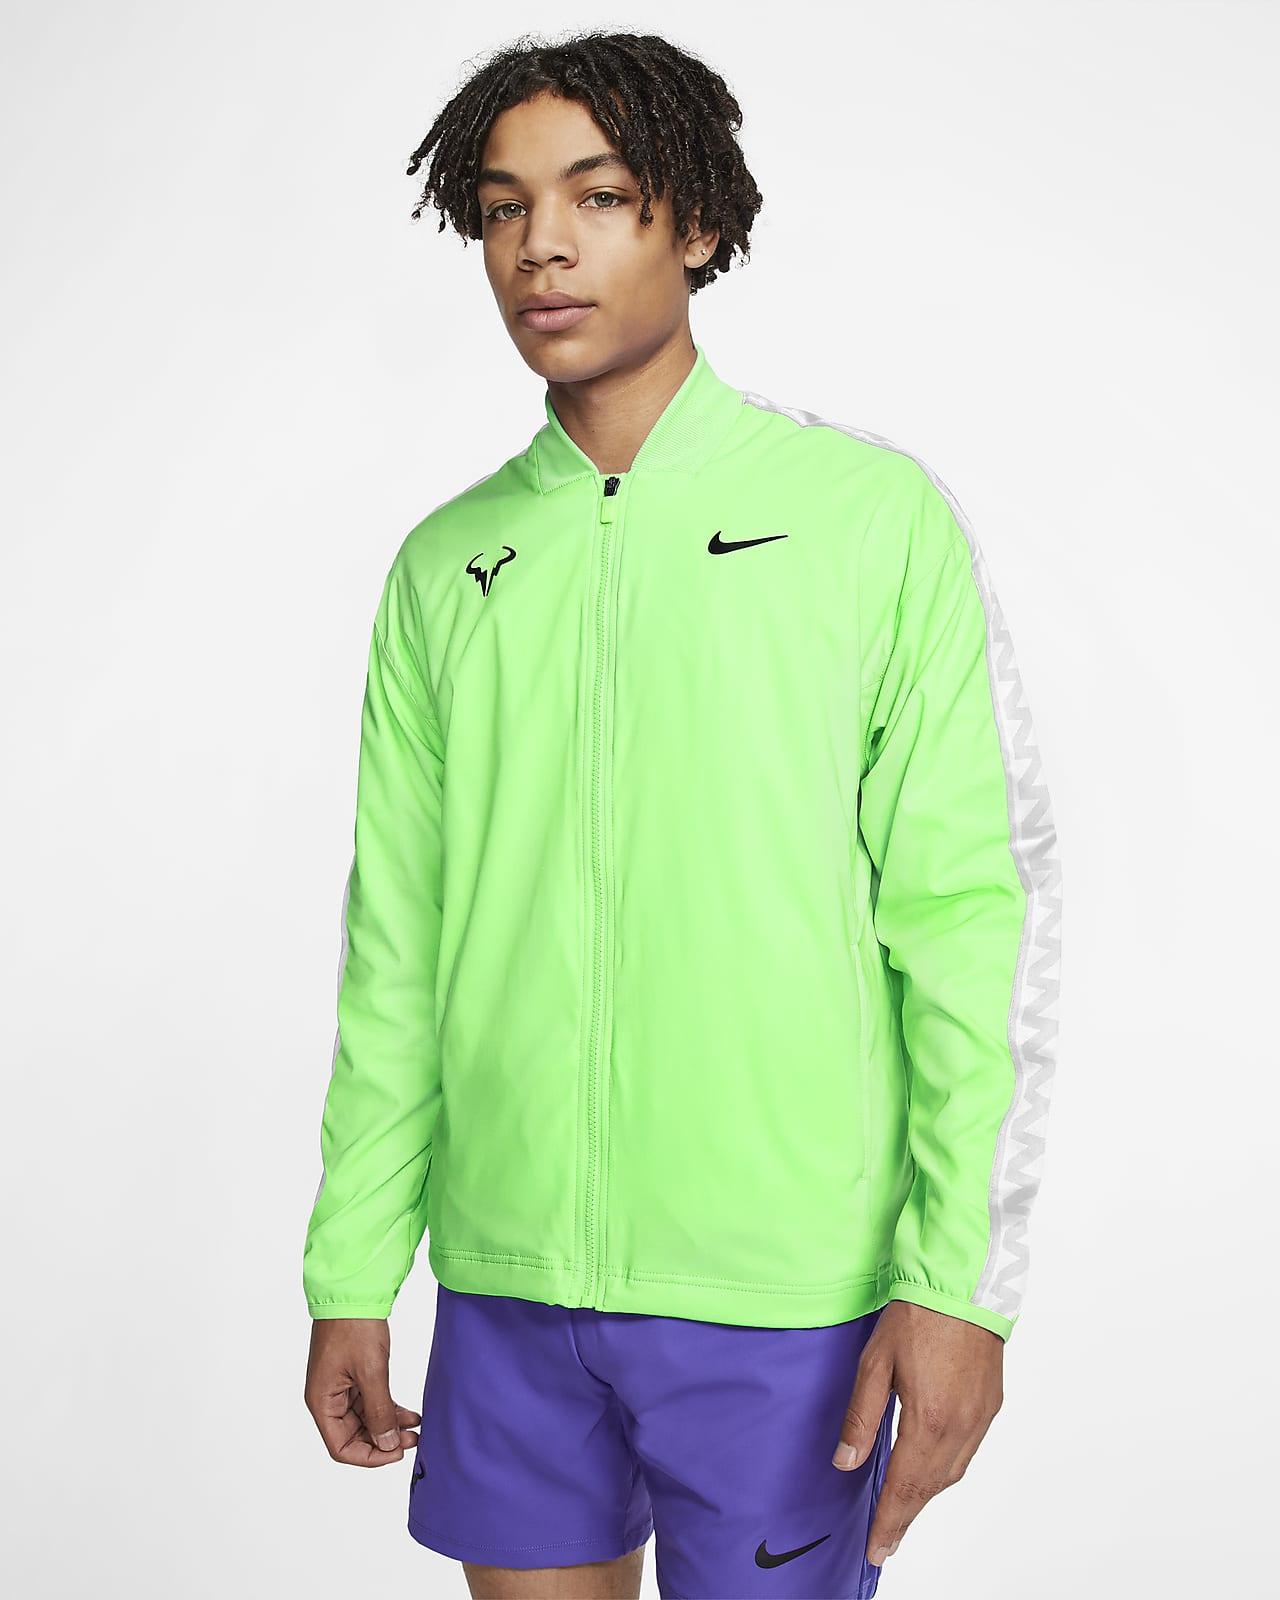 Rafa Men's Tennis Jacket